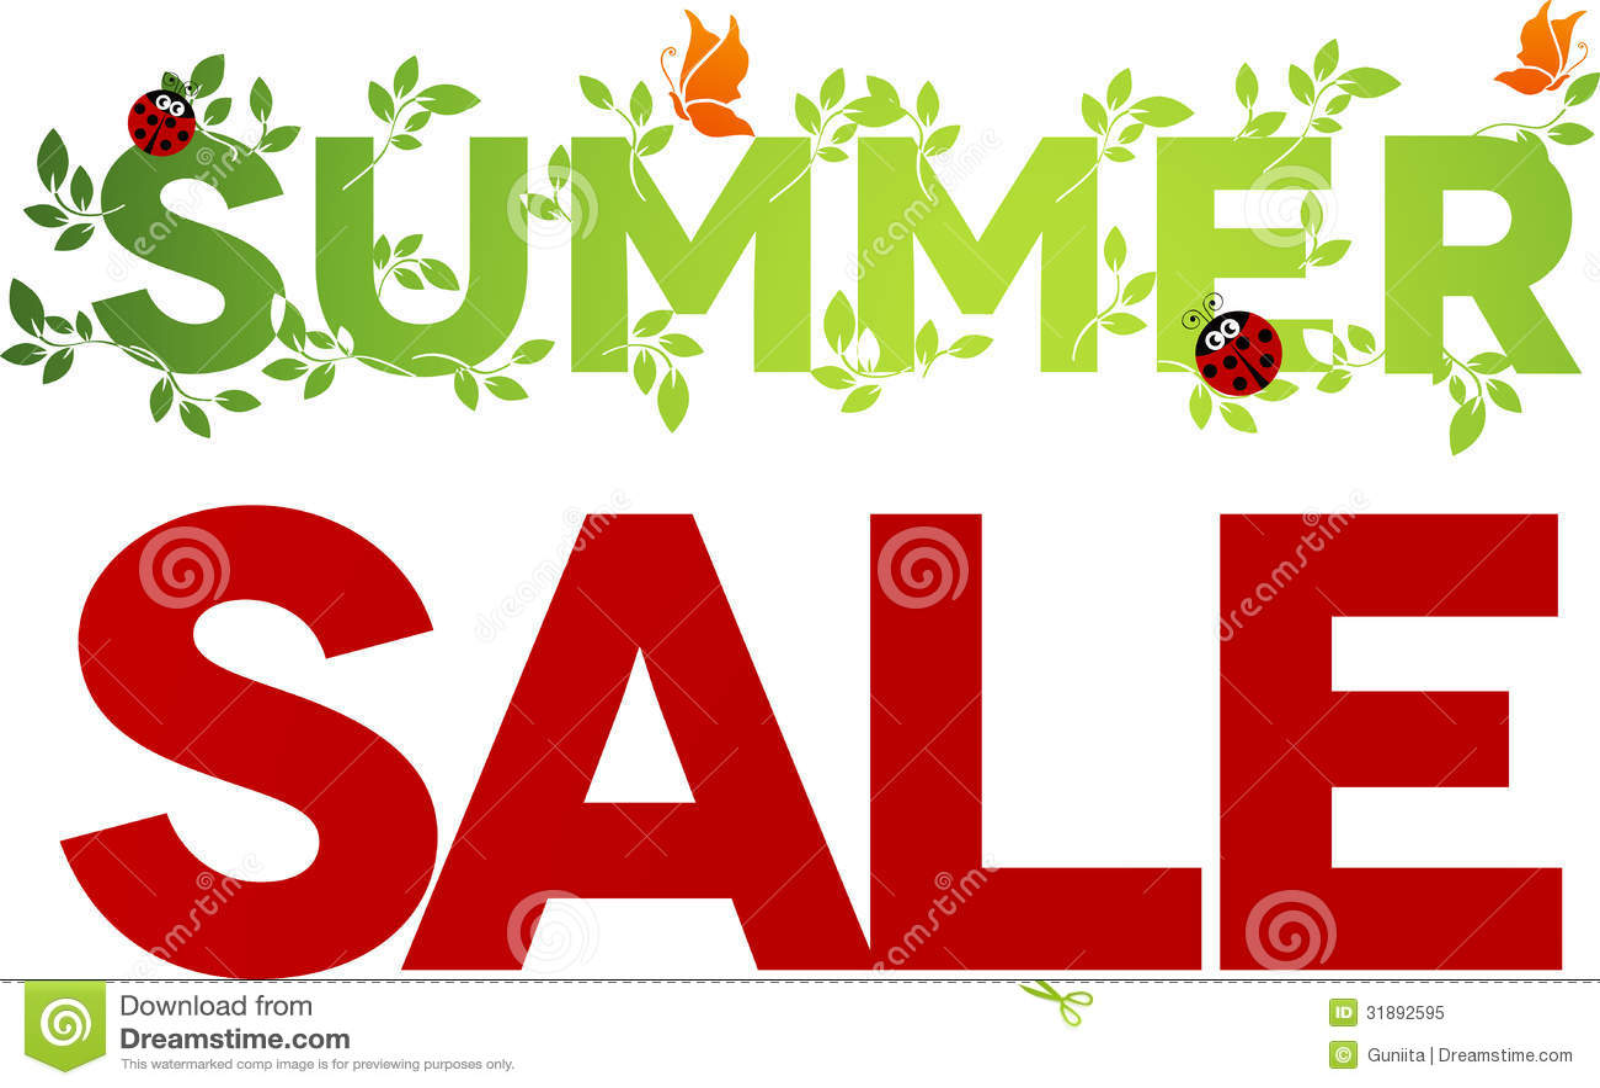 Summer Sale Design Royalty Free Stock Photo - Image: 31892595